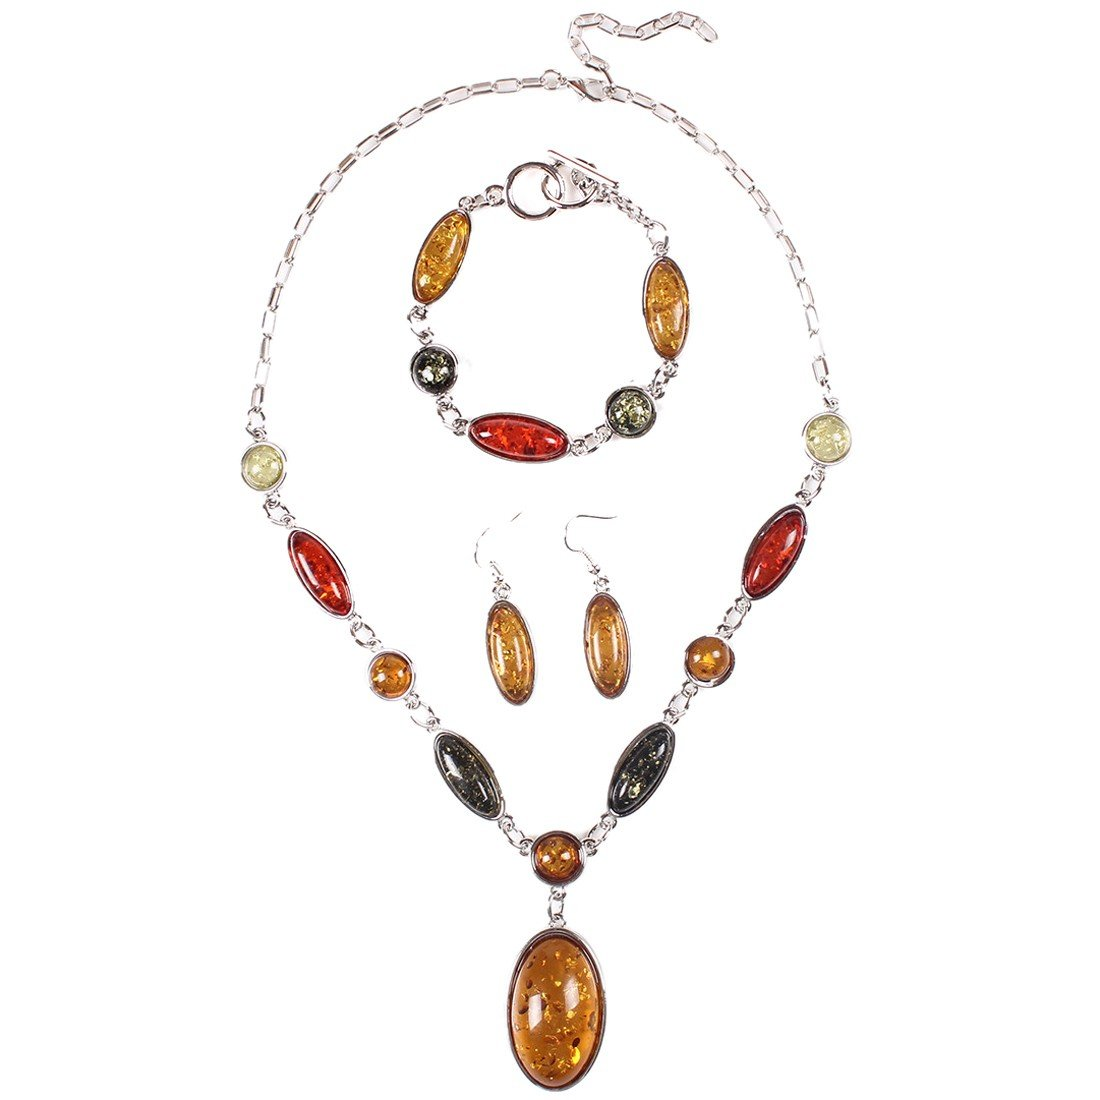 Qiyun Amber Beaded Multi-Colored Pendant Silver Necklace Earring Bracelet Set Bracelet En Argent Ambre Multicolore Collier W005N1126